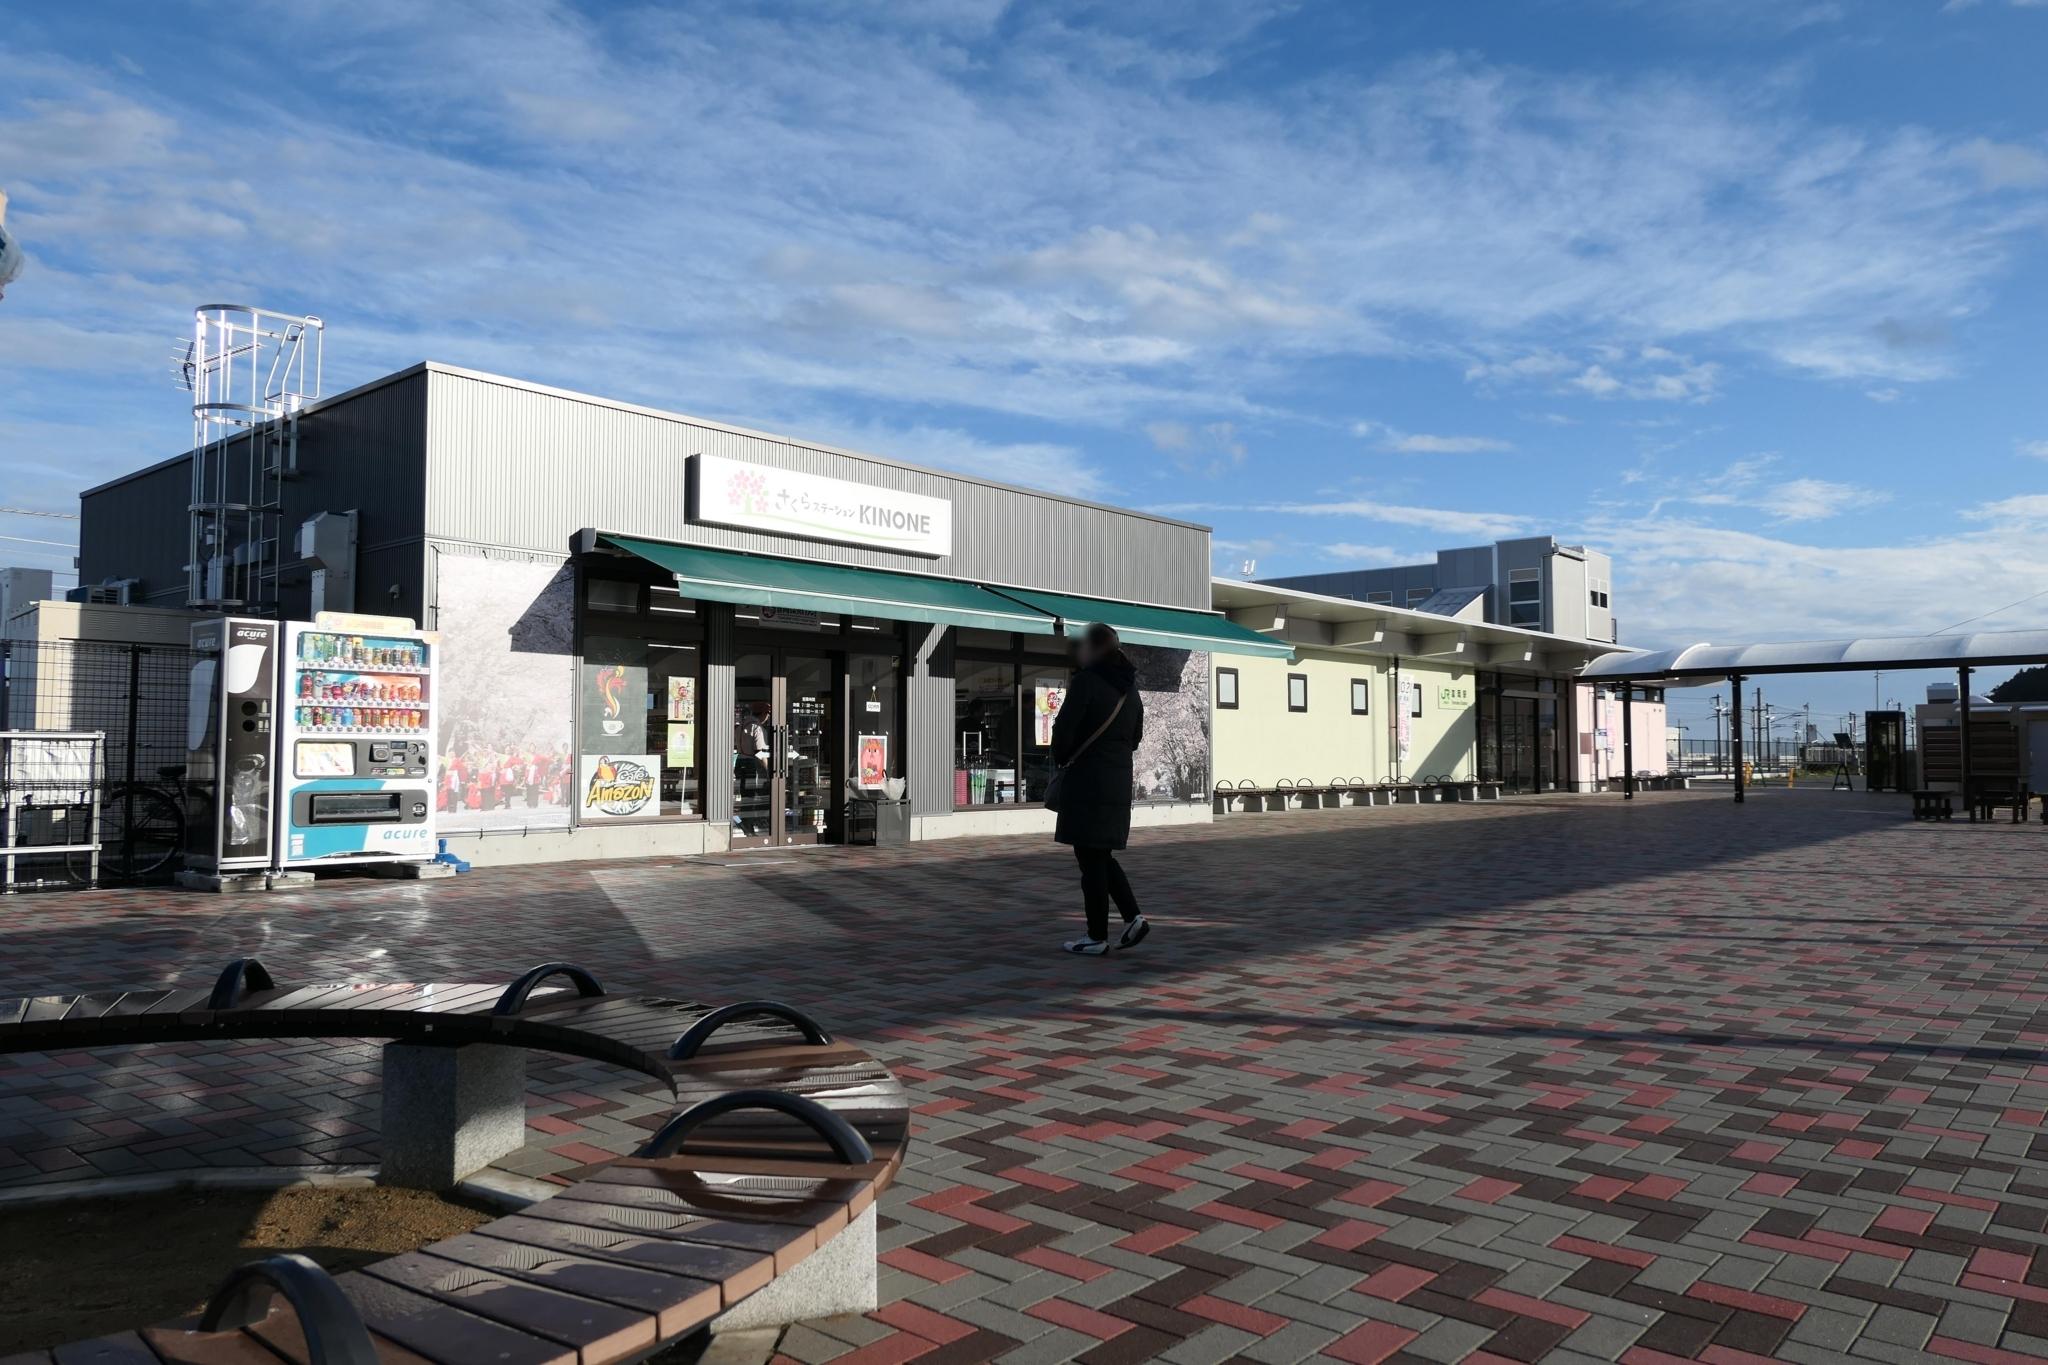 f:id:ToshUeno:20171203213419j:plain